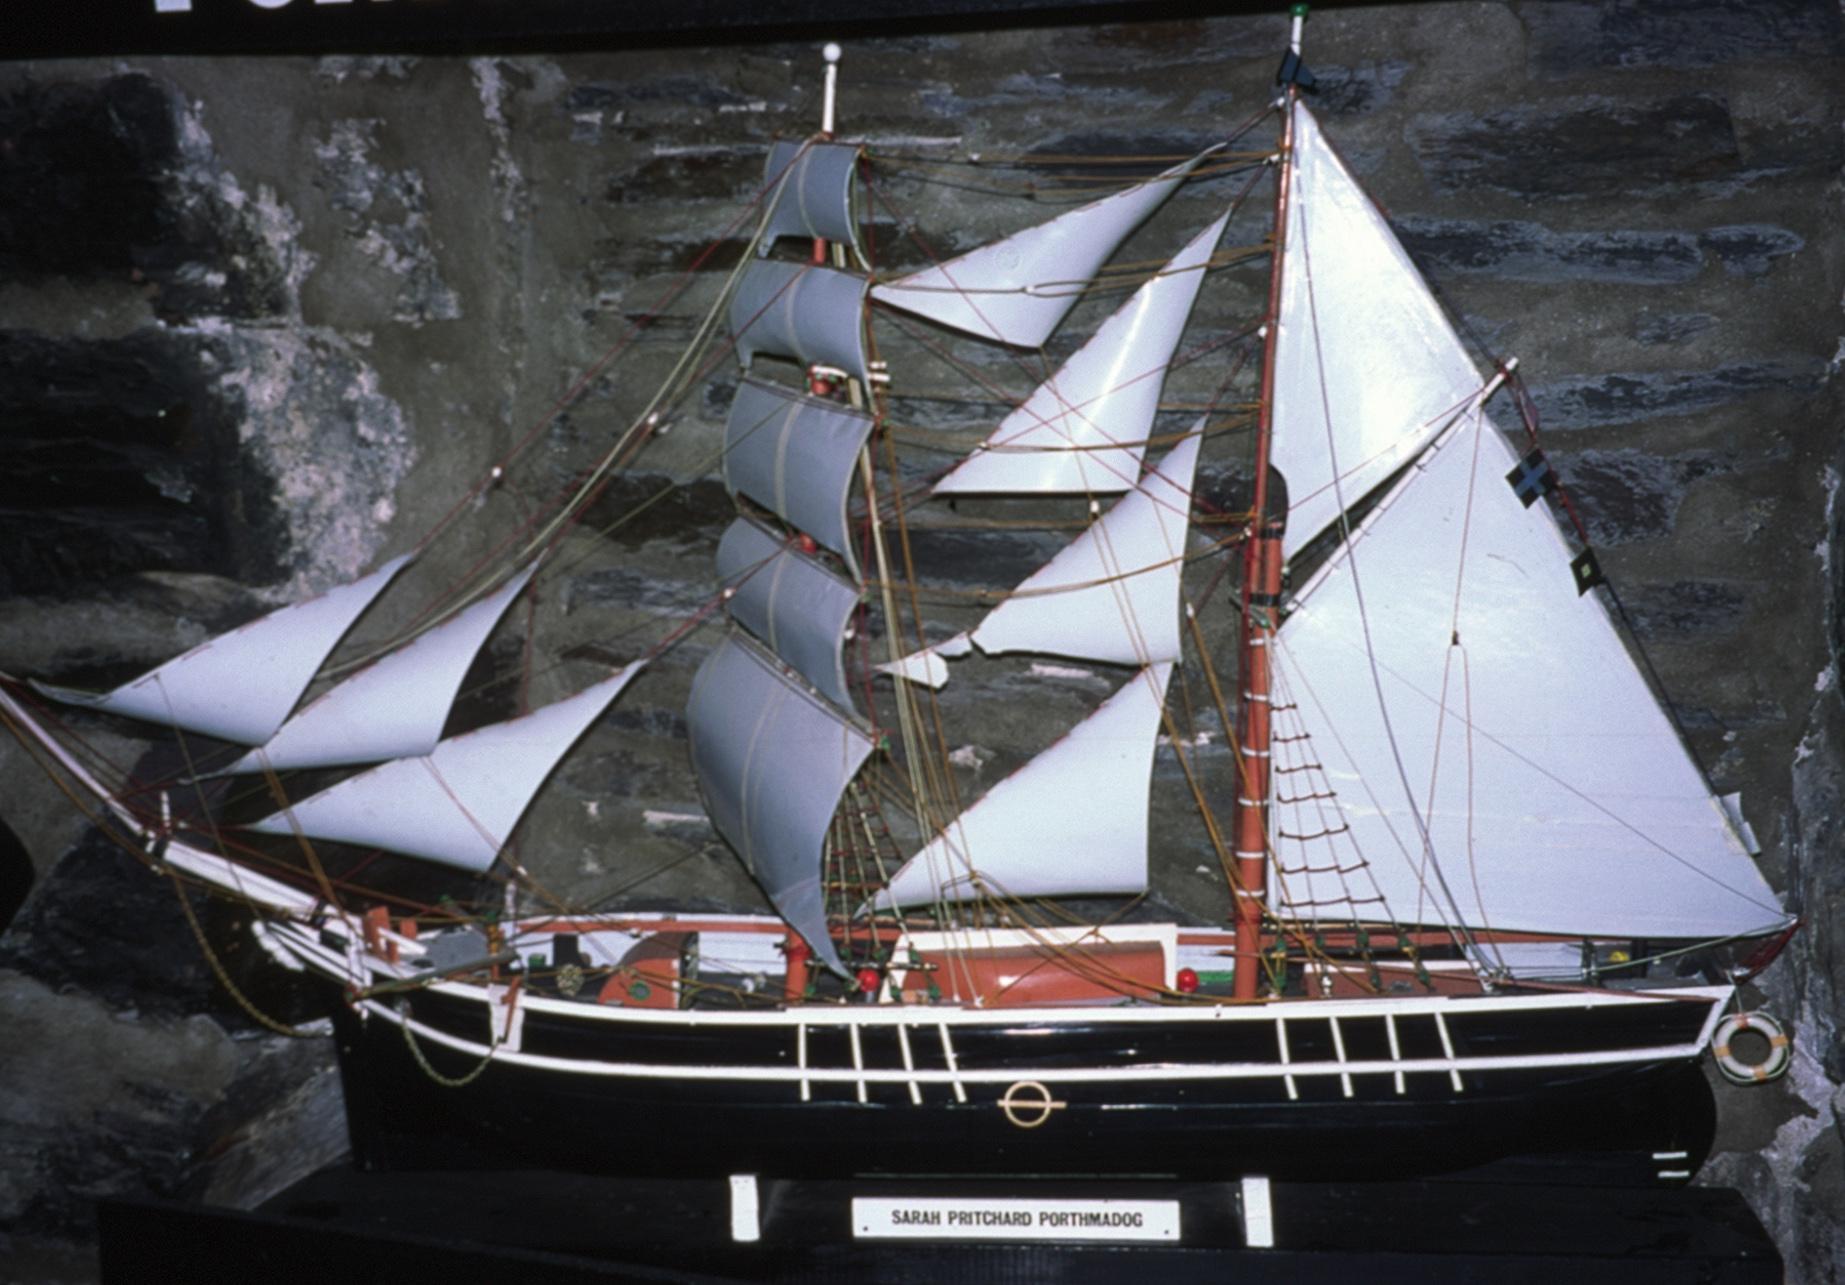 brigantine-sarah-pritchard